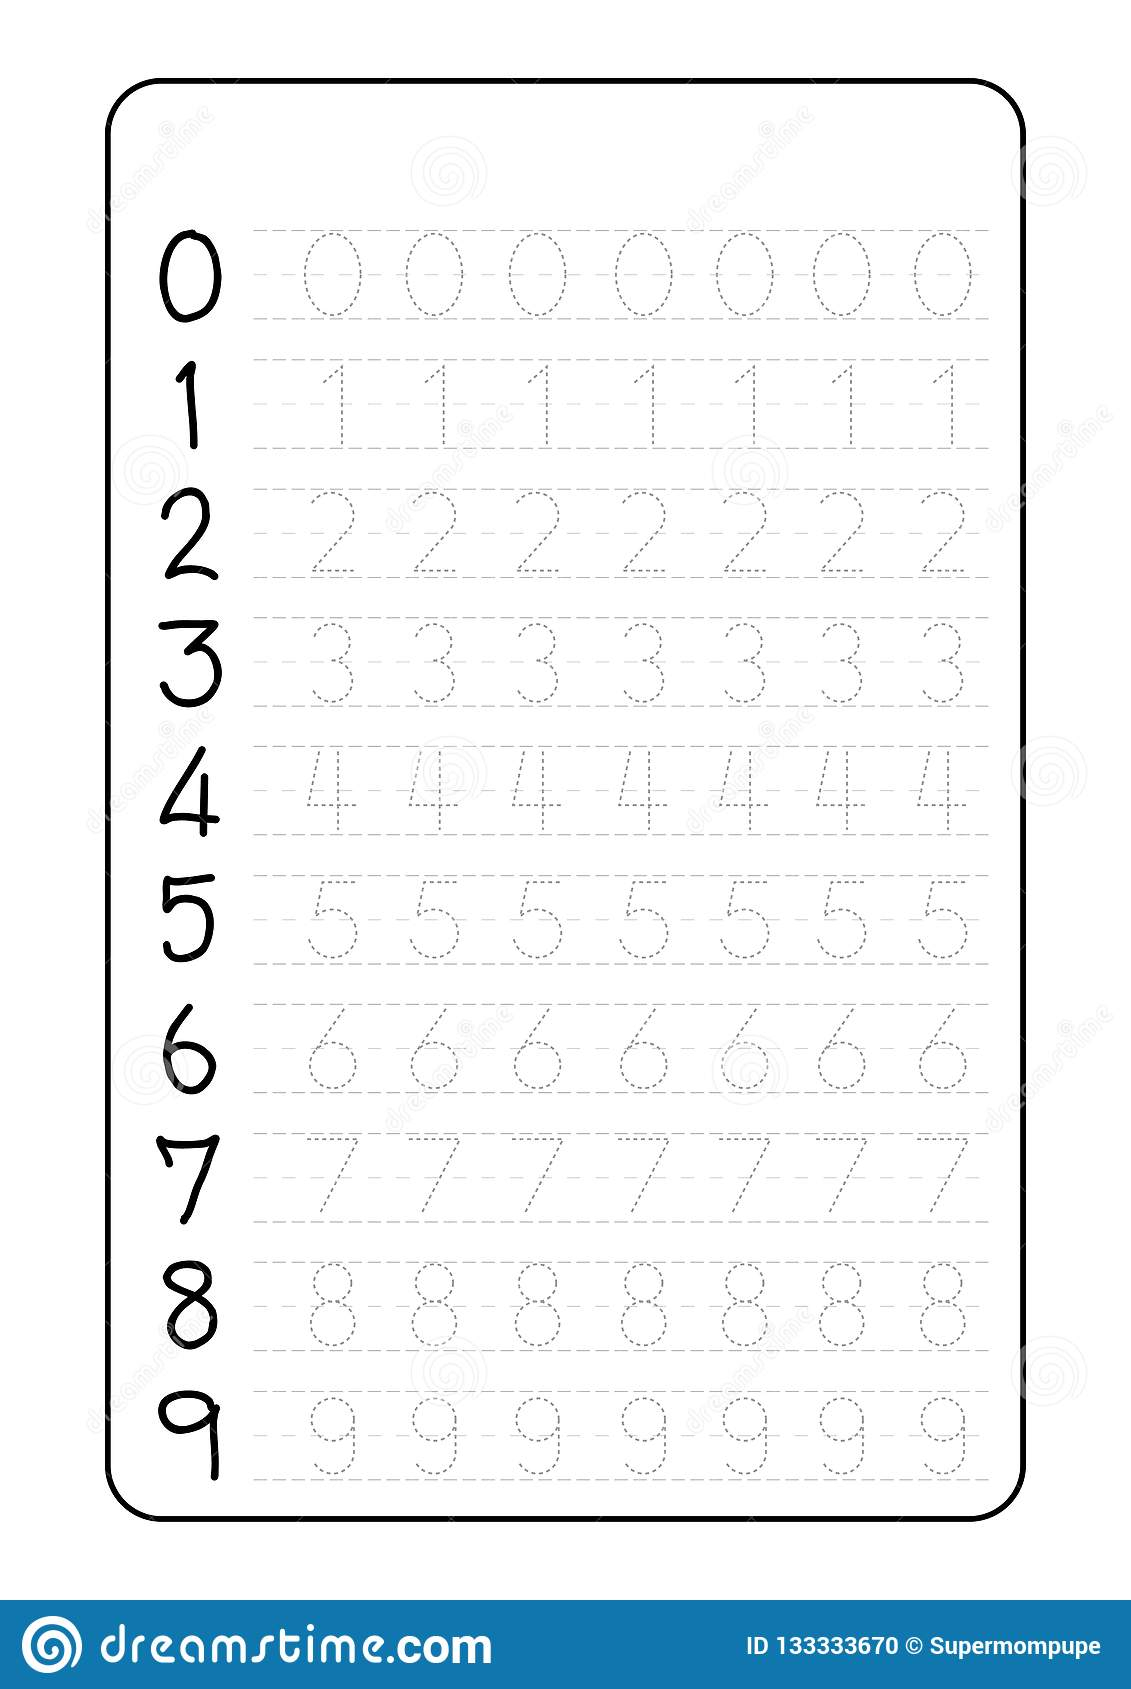 Alphabet Letters Tracing Worksheet With Number Children regarding Alphabet Tracing Sheets For Kindergarten